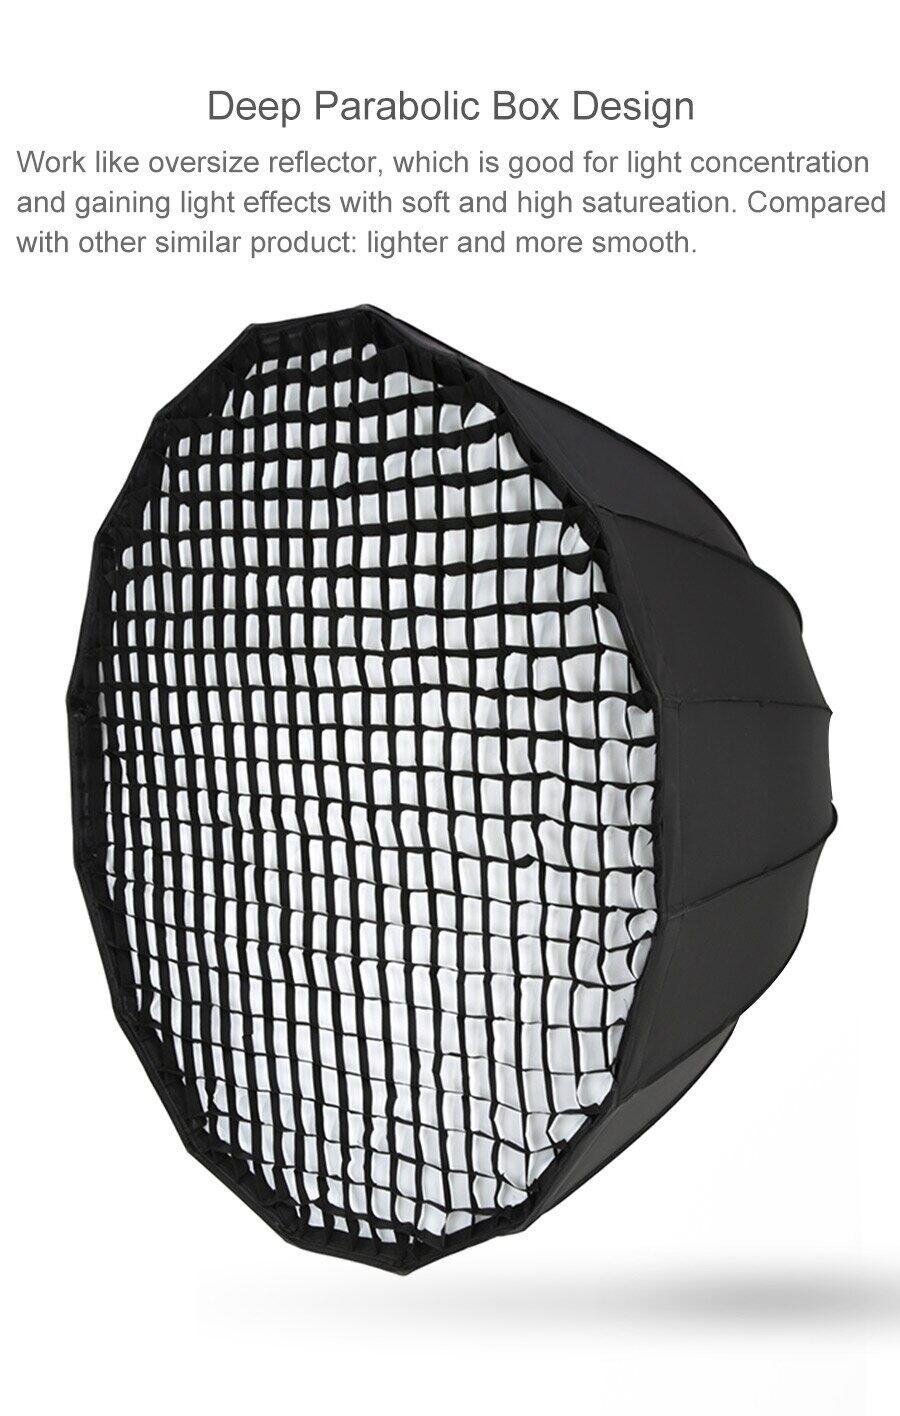 Godox P120L 120CM Portable Deep Parabolic Honeycomb Grid Softbox Bowens Mount Studio Flash Reflector Photo Studio Softbox